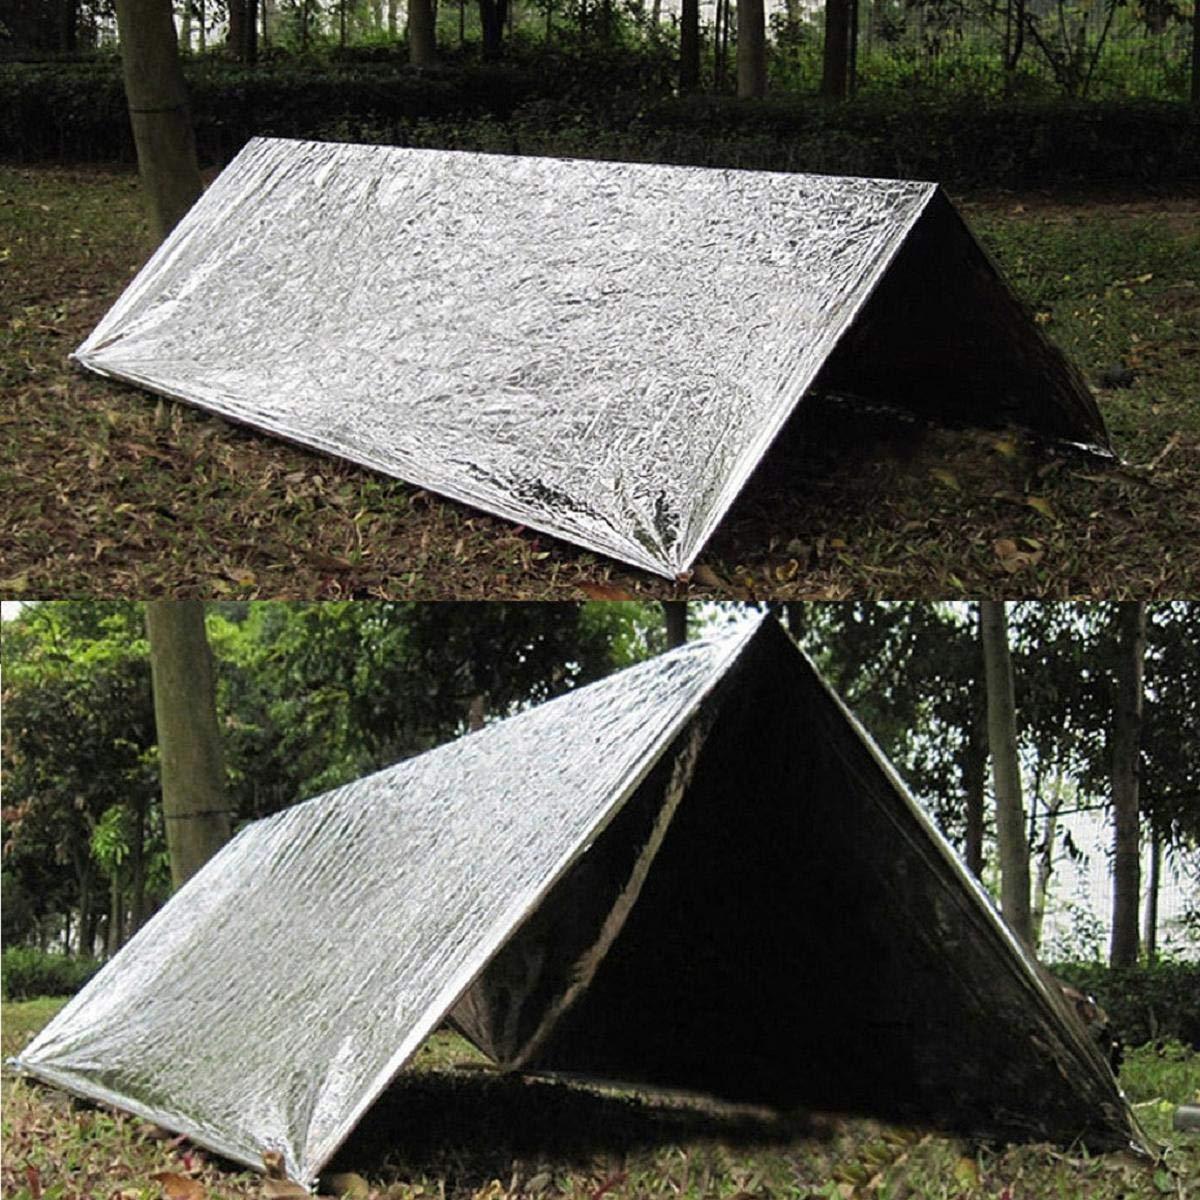 Compact and Water Resistant for a Comfortable Warm Sleep Lightweight Single 3 Season Sleeping Bags for Adults and Sleeping Bags for Kids Outdoor Camping Barlingrock 2019 New Sleeping Bag